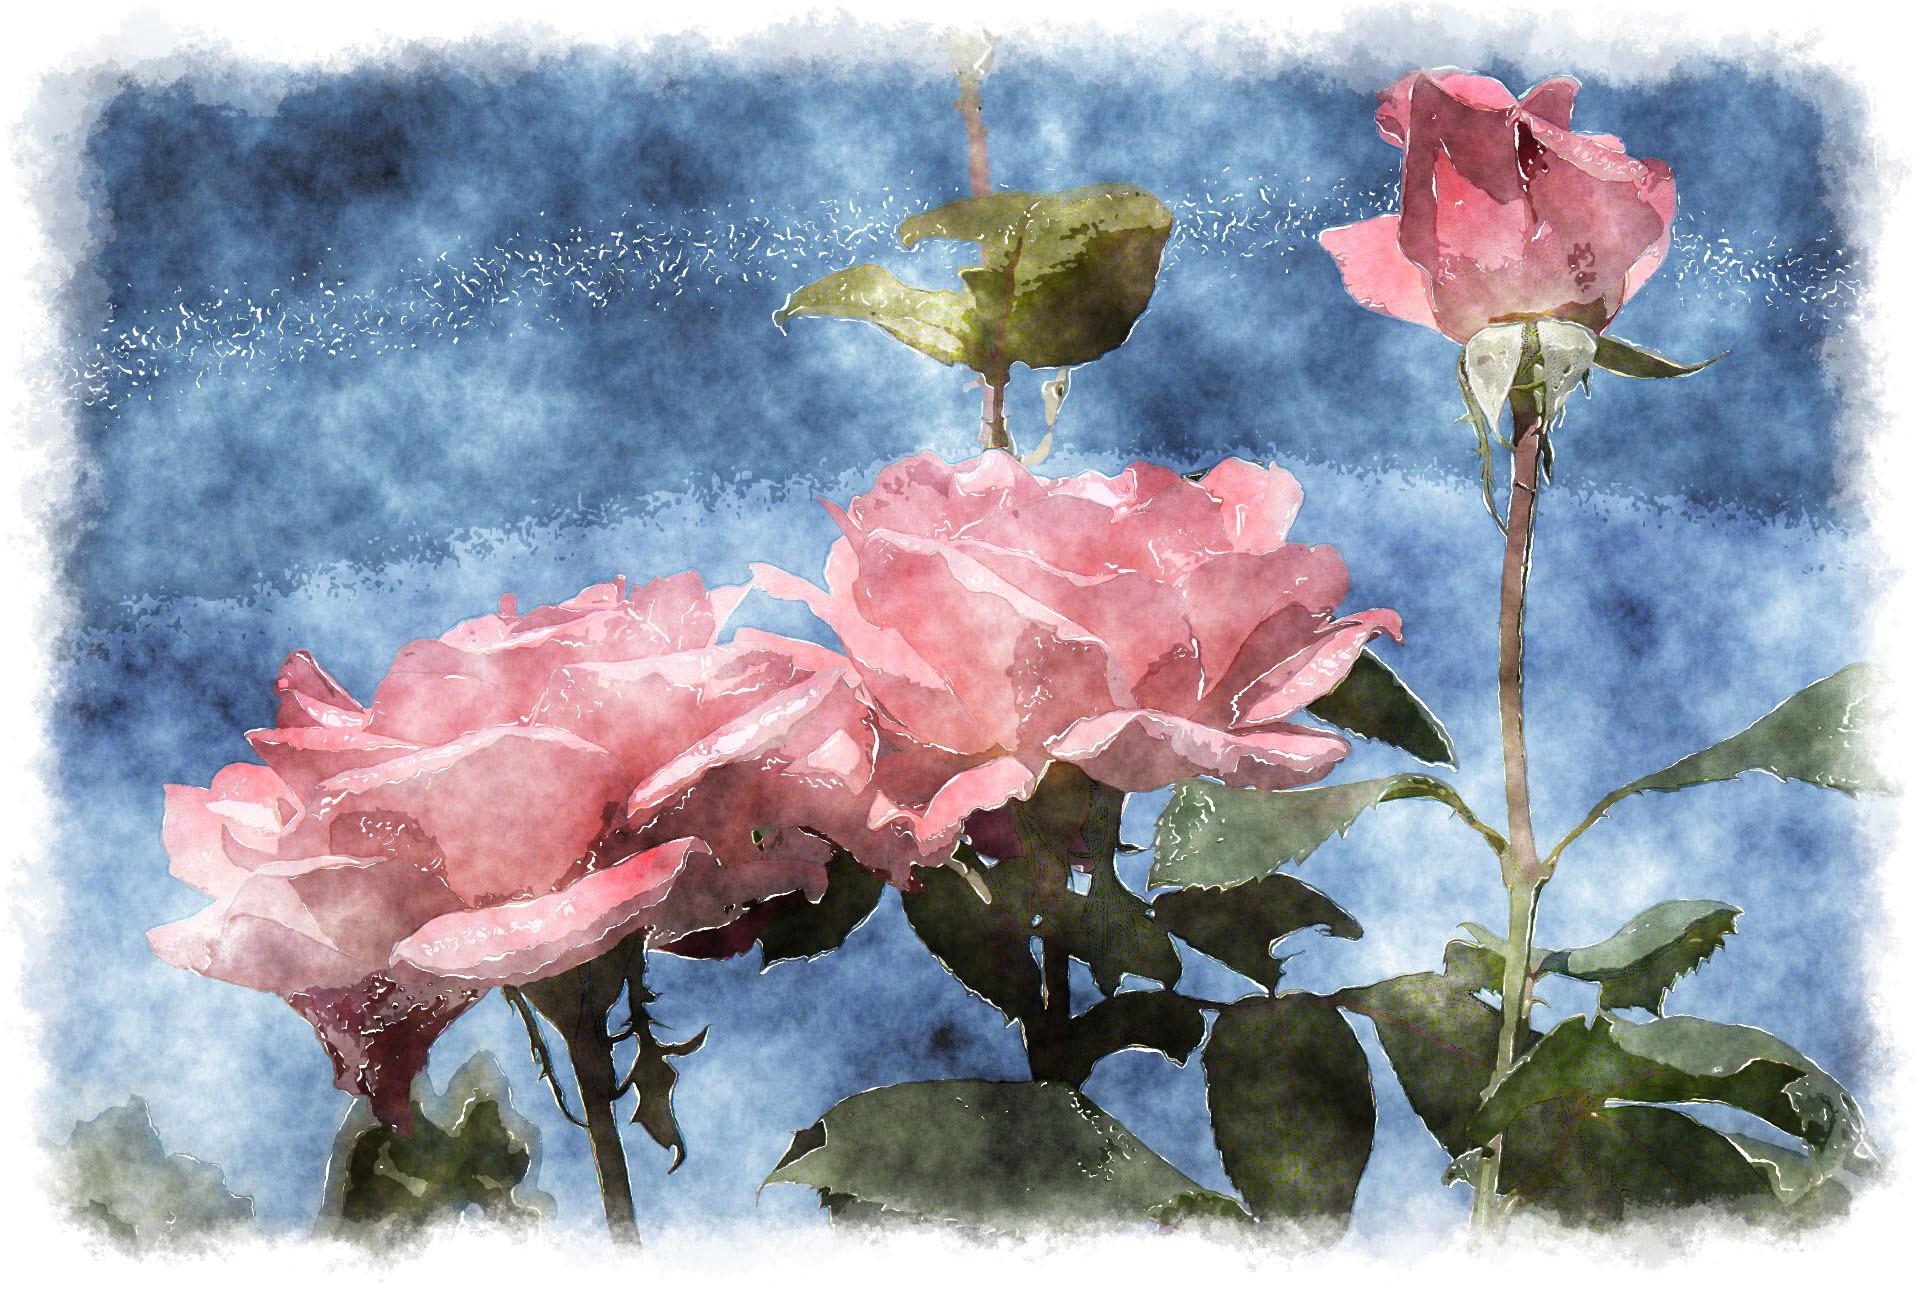 Watercolor Iphone Wallpaper Blue | Top Pictures Gallery Online